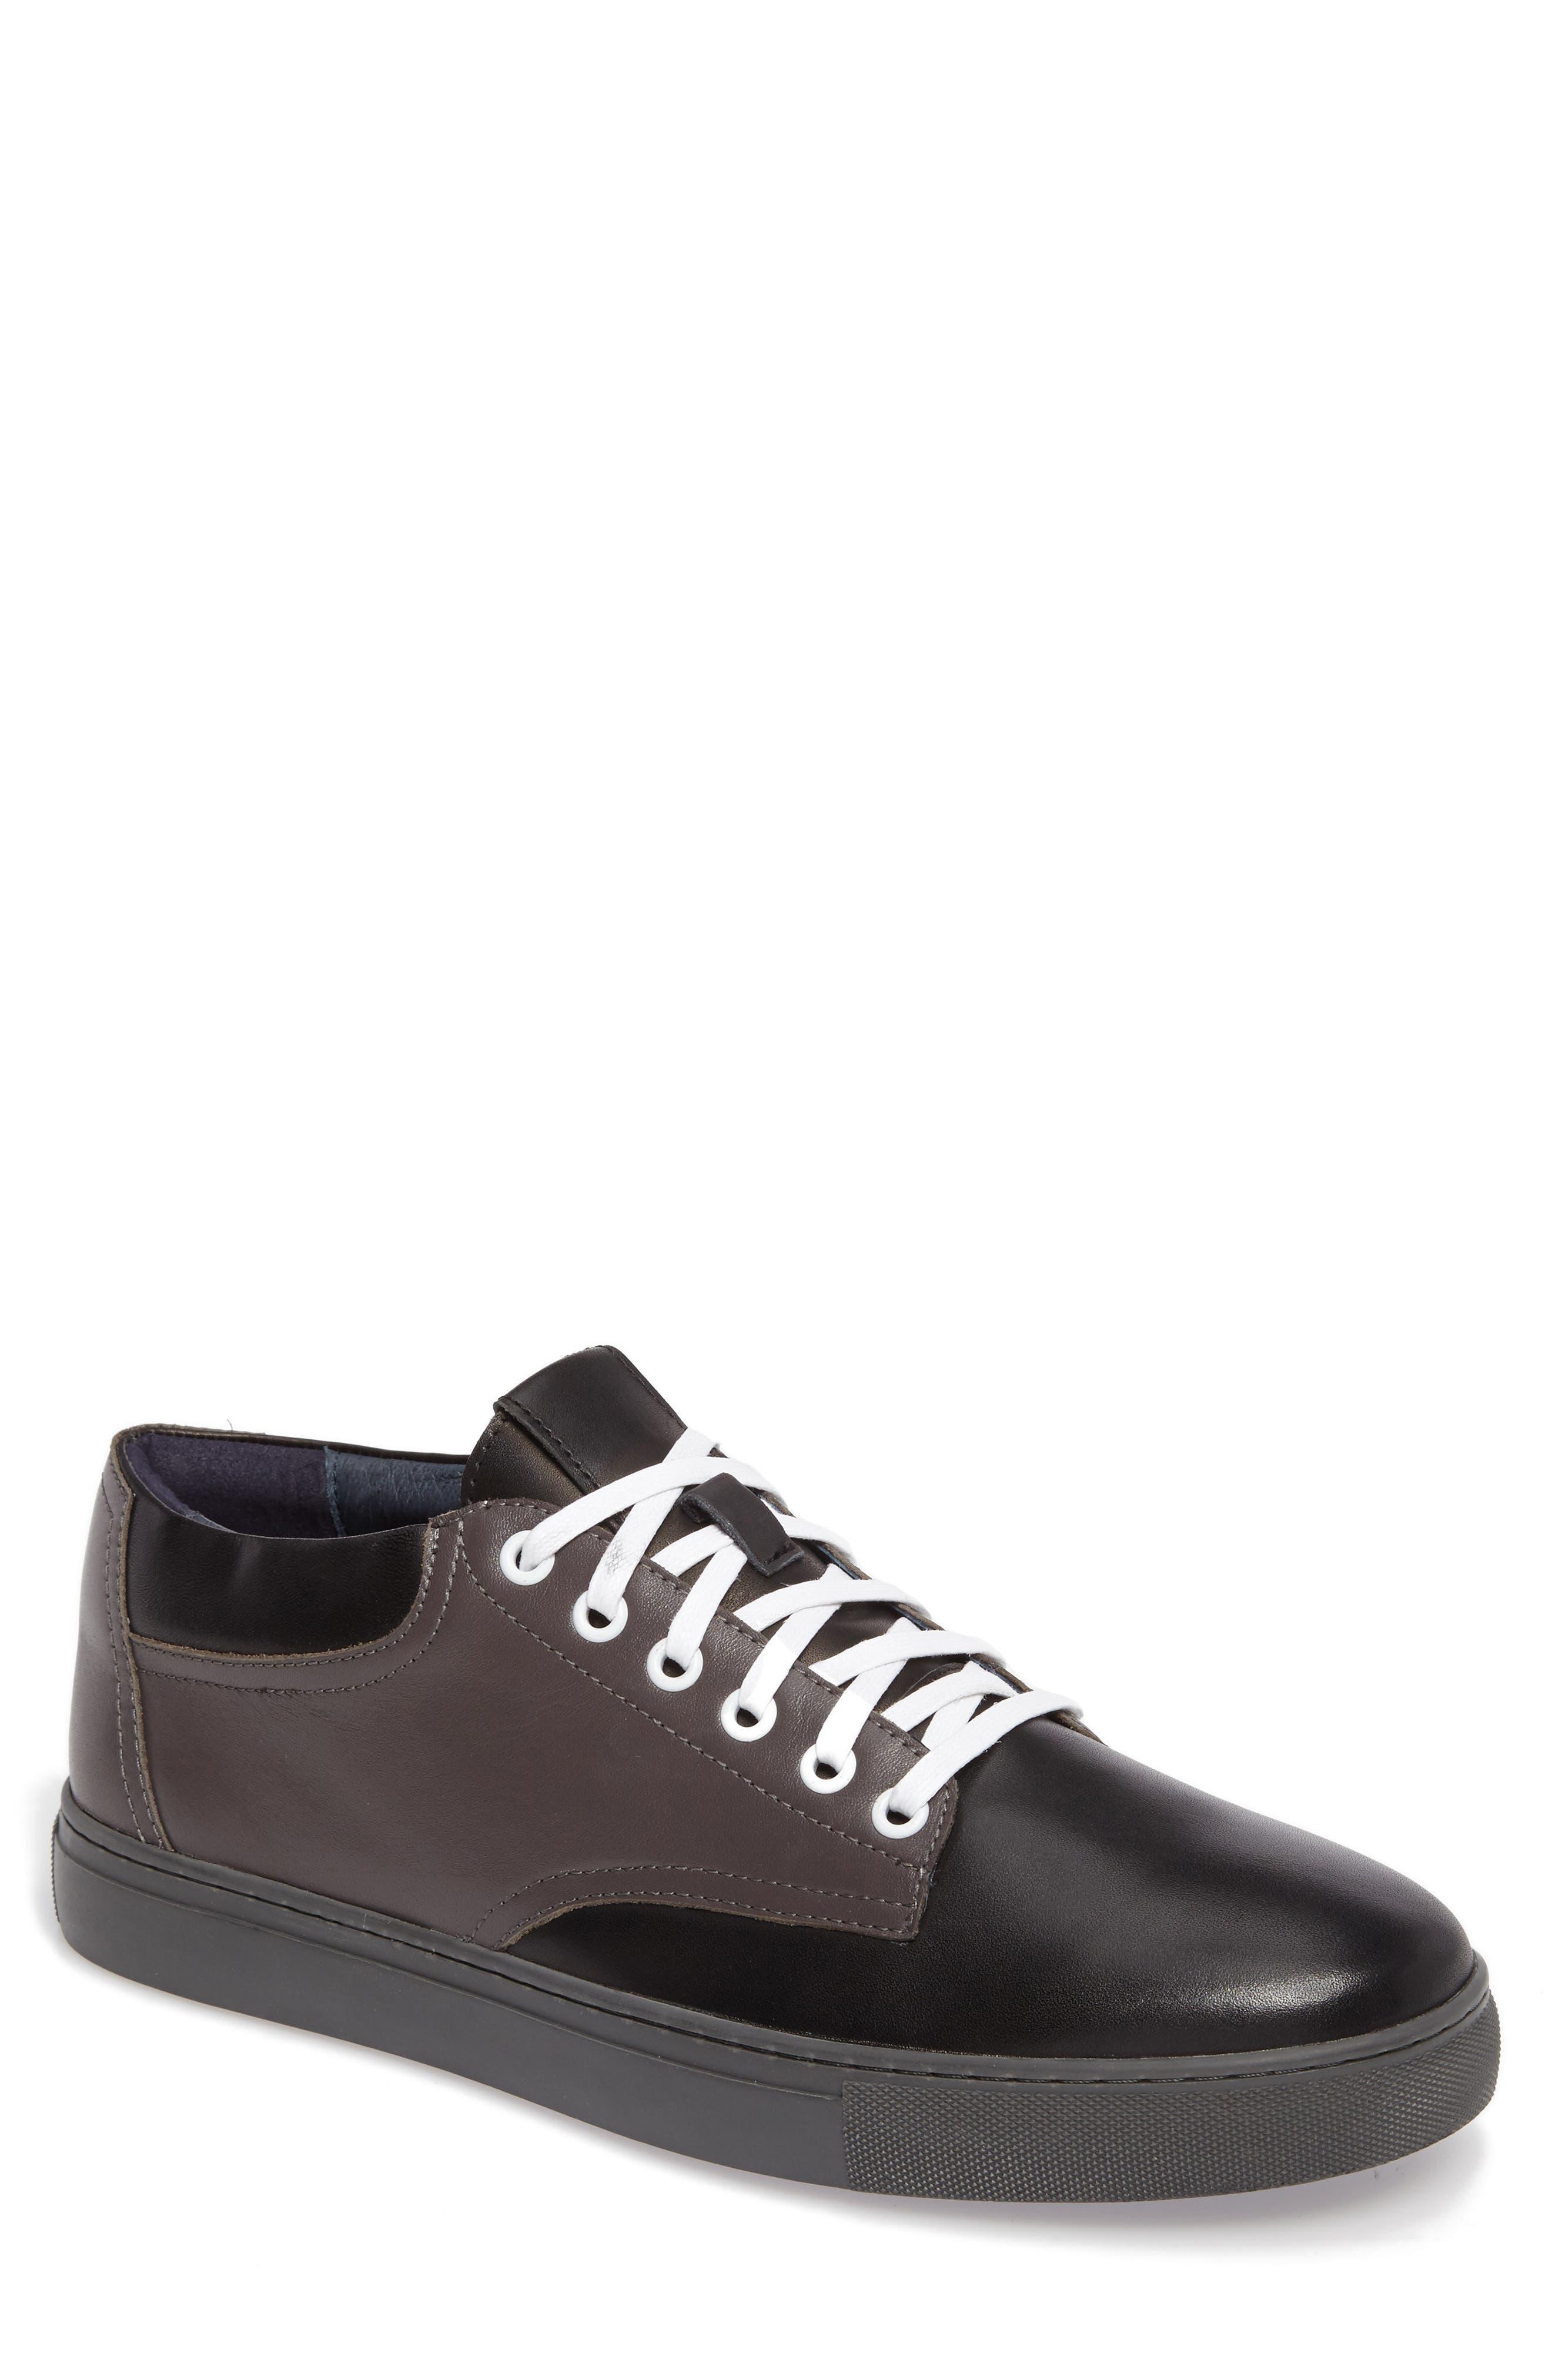 Ralston Sneaker,                             Main thumbnail 1, color,                             021